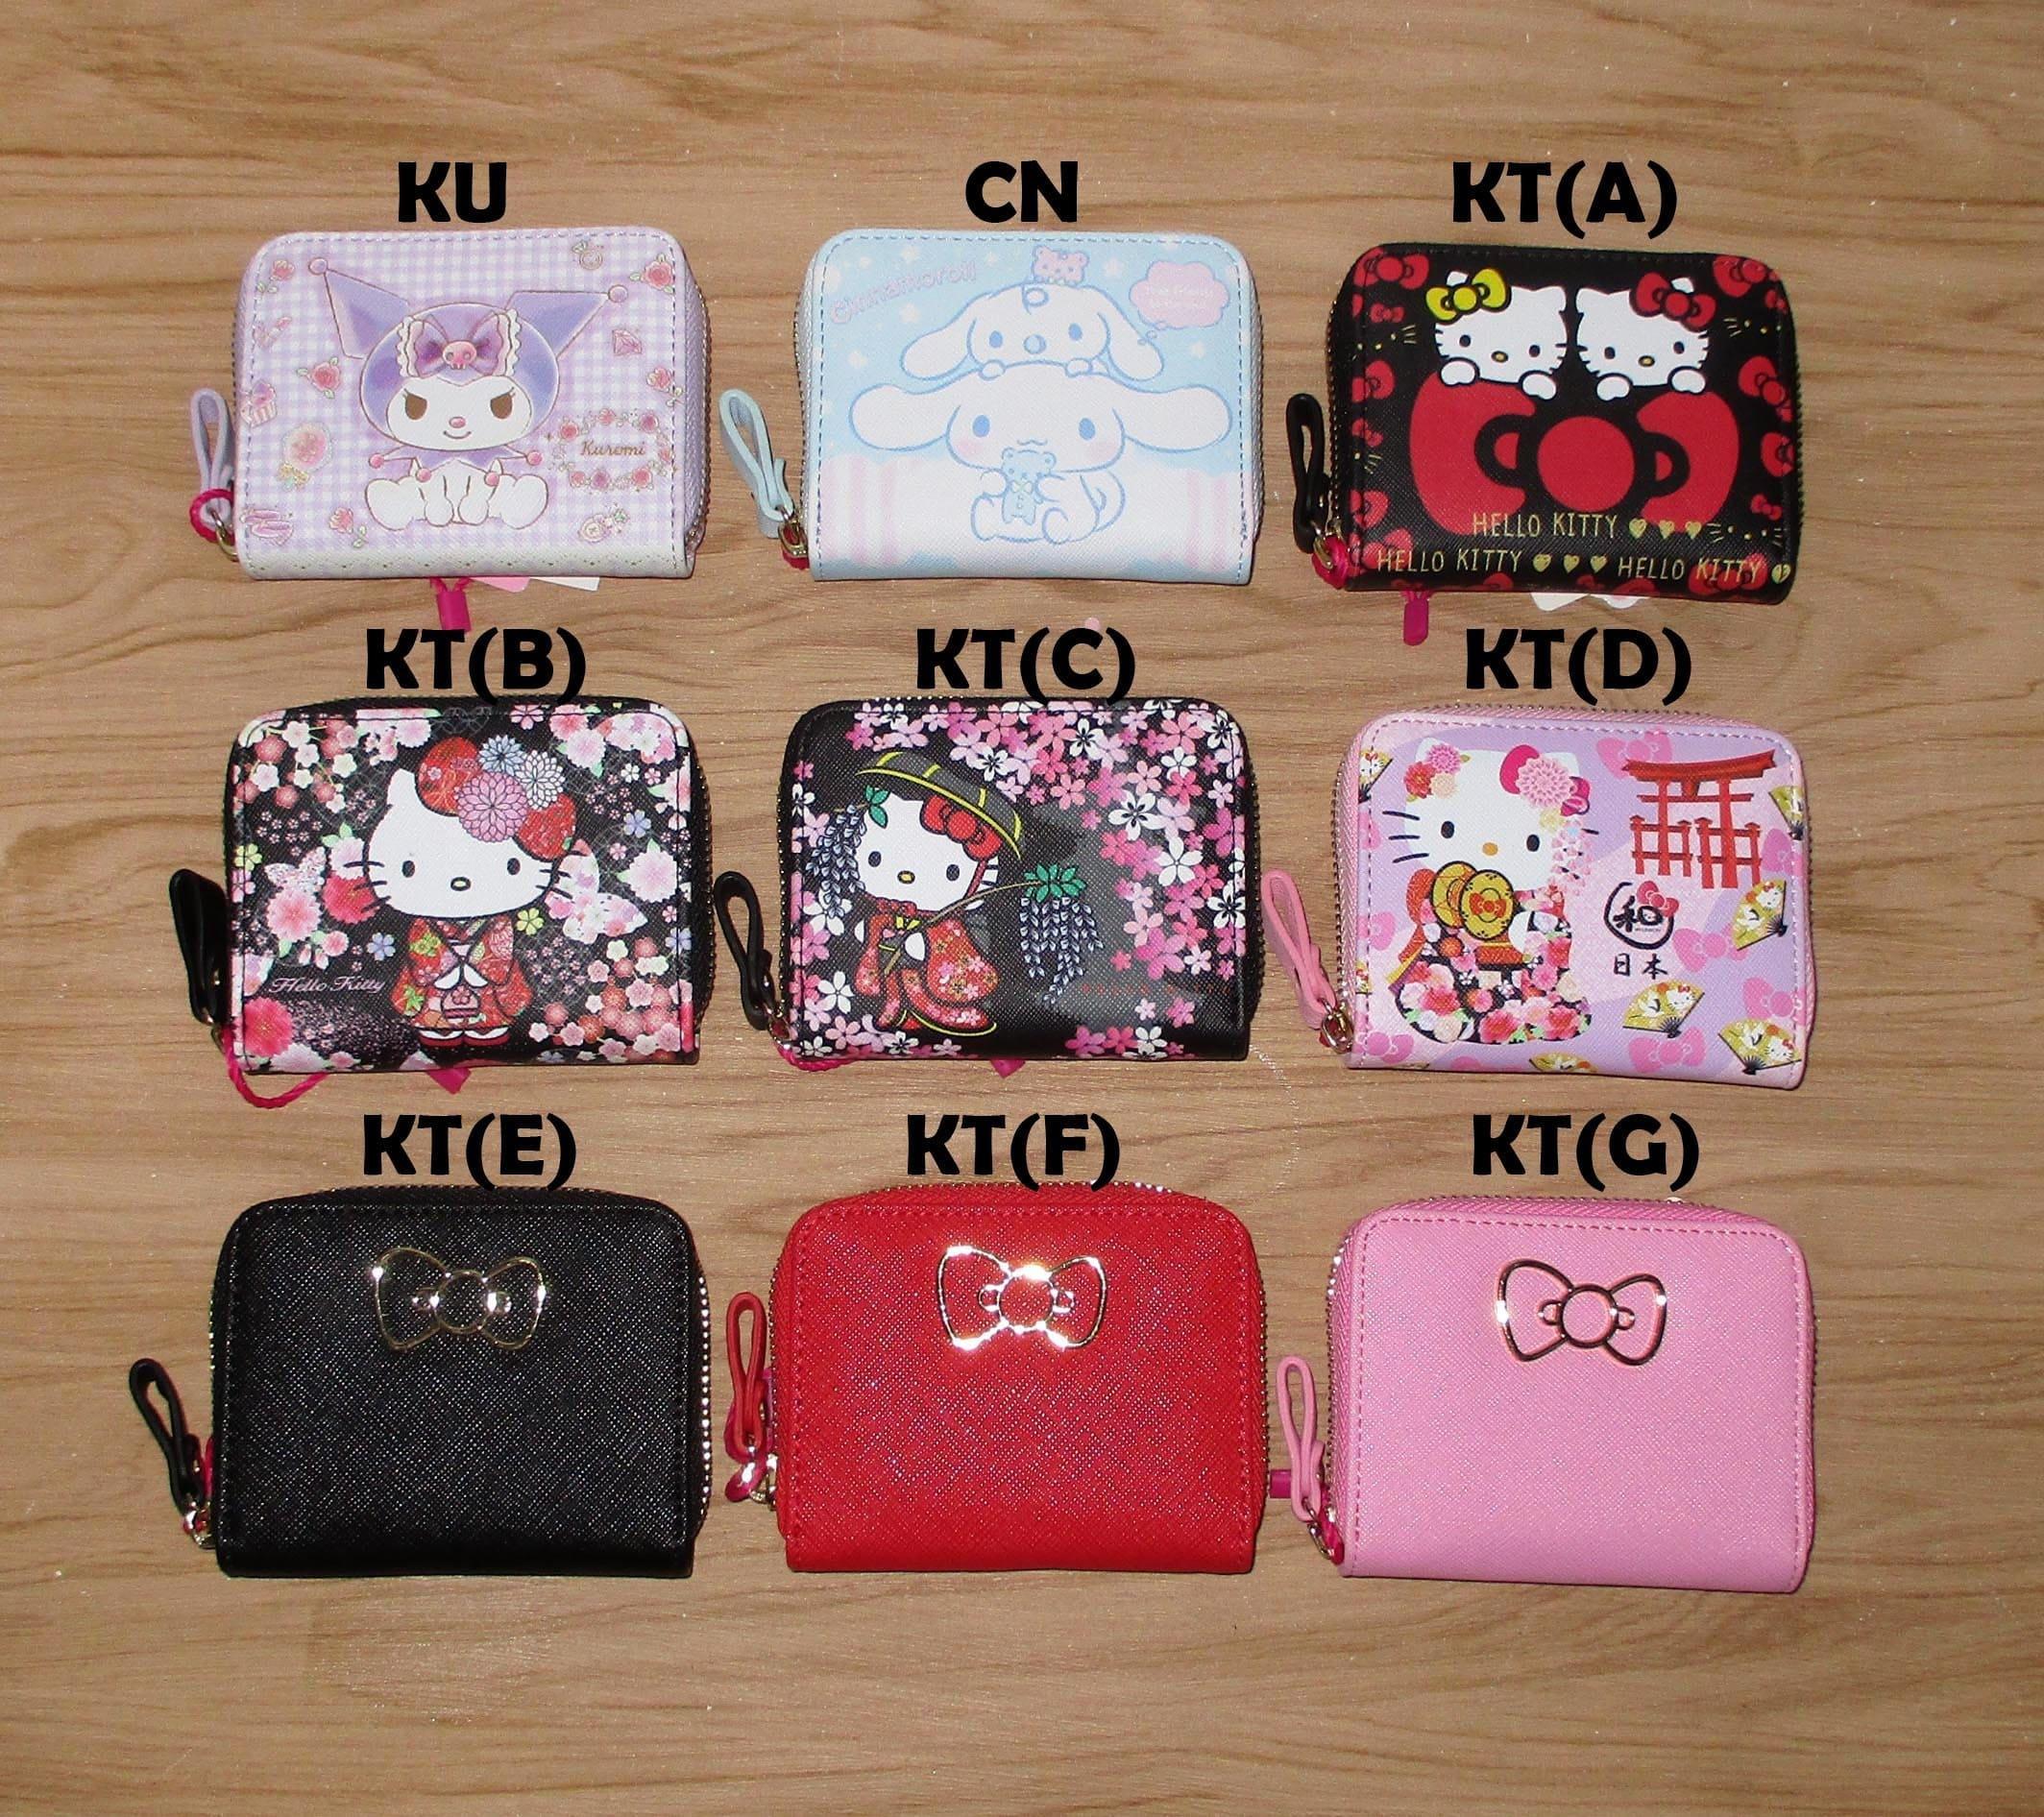 Japon Sanrio Cinnamoroll Kuromi Hello Kitty Coffret Etsy